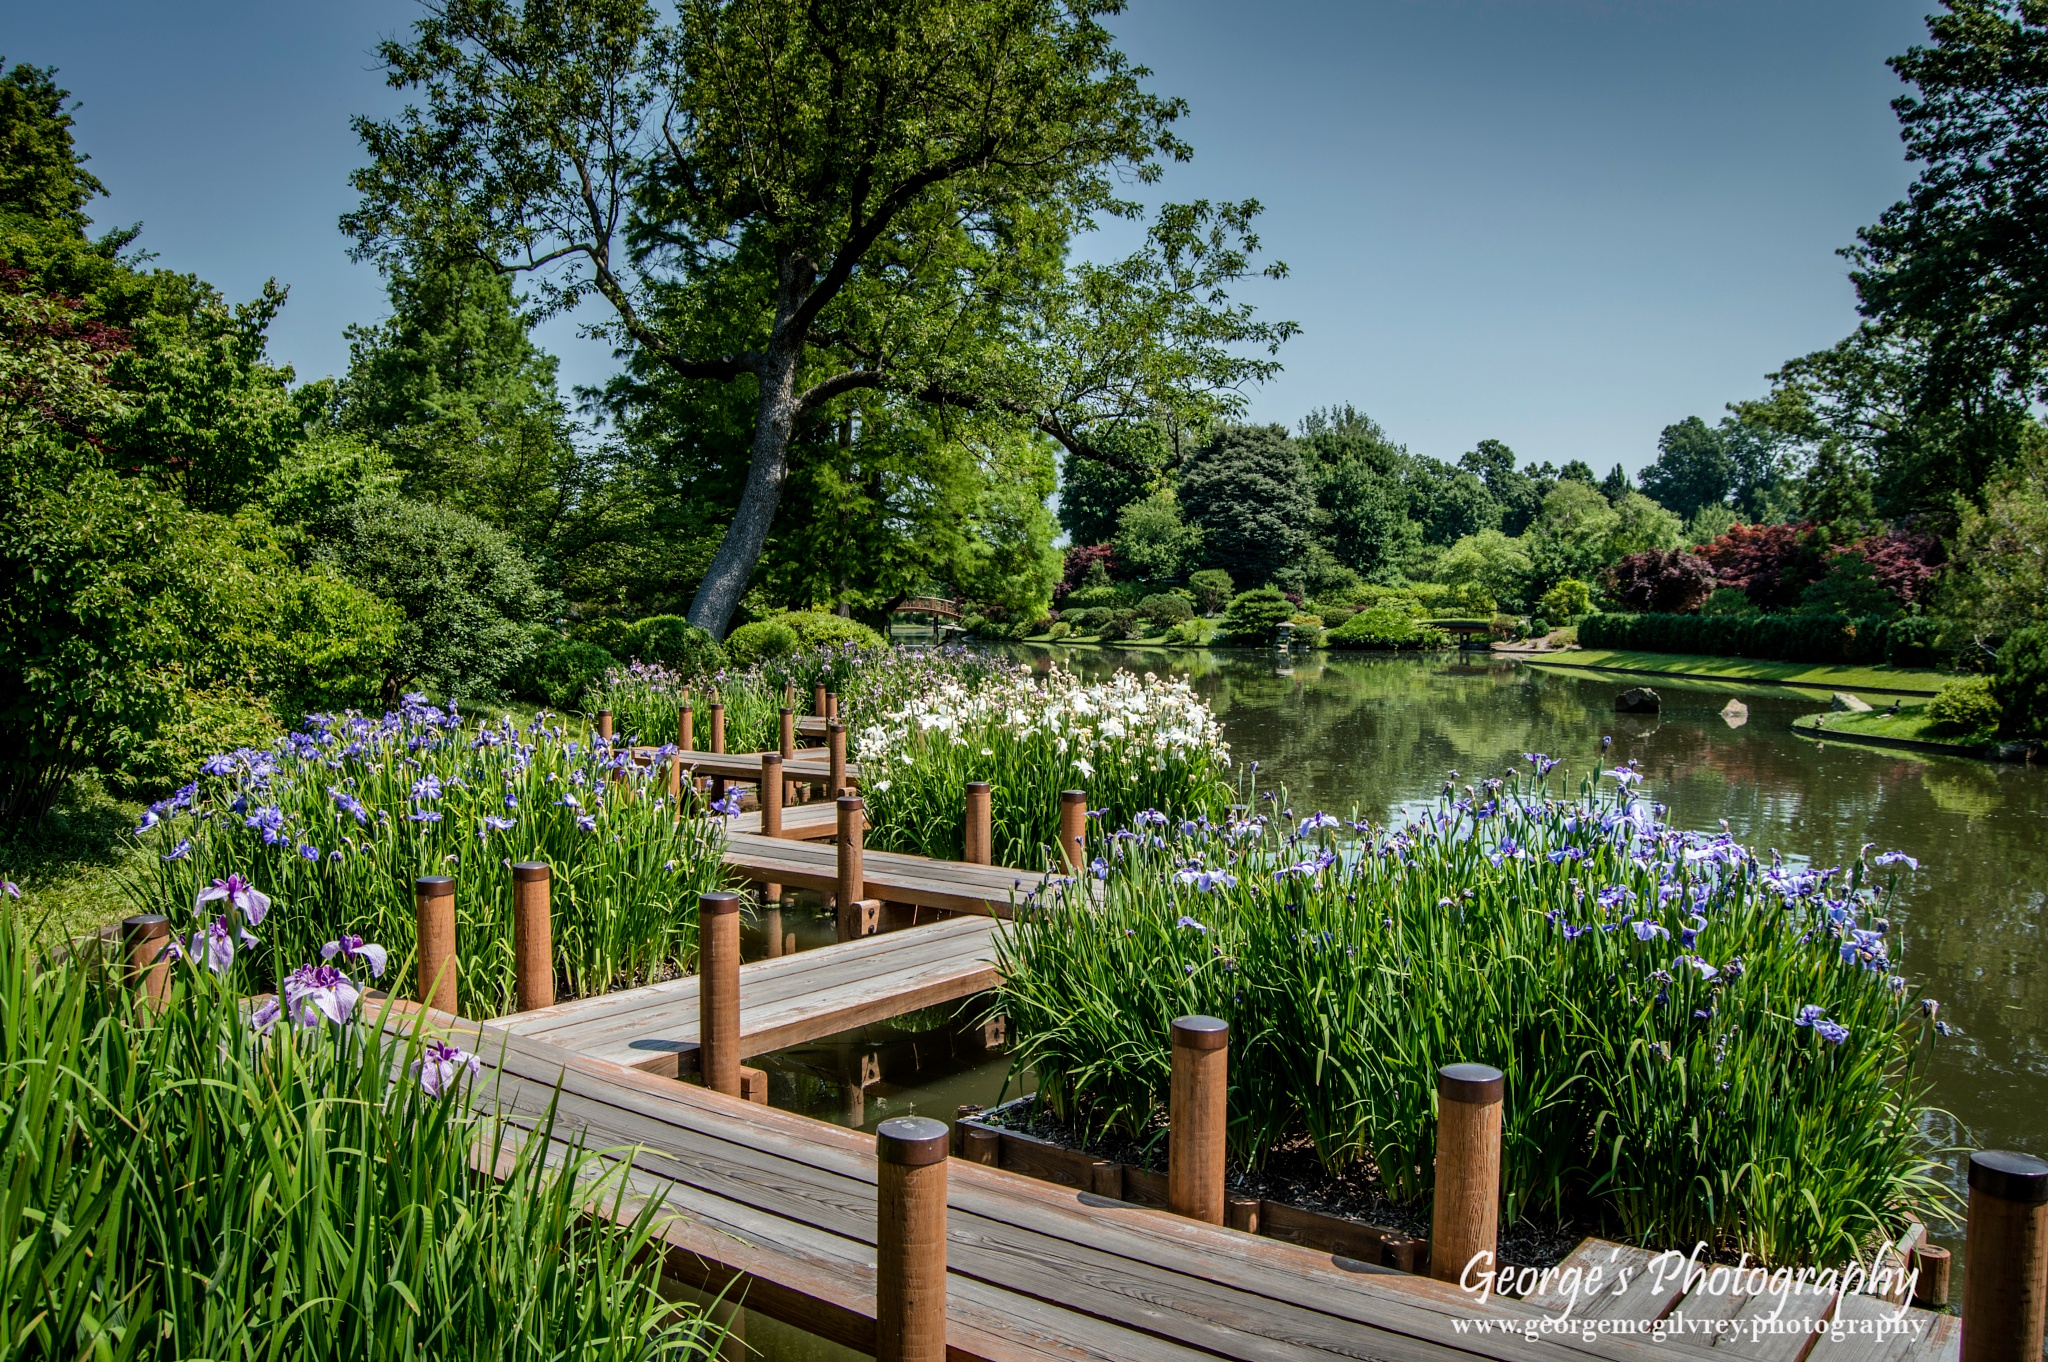 A Walk In The Garden by George McGilvrey